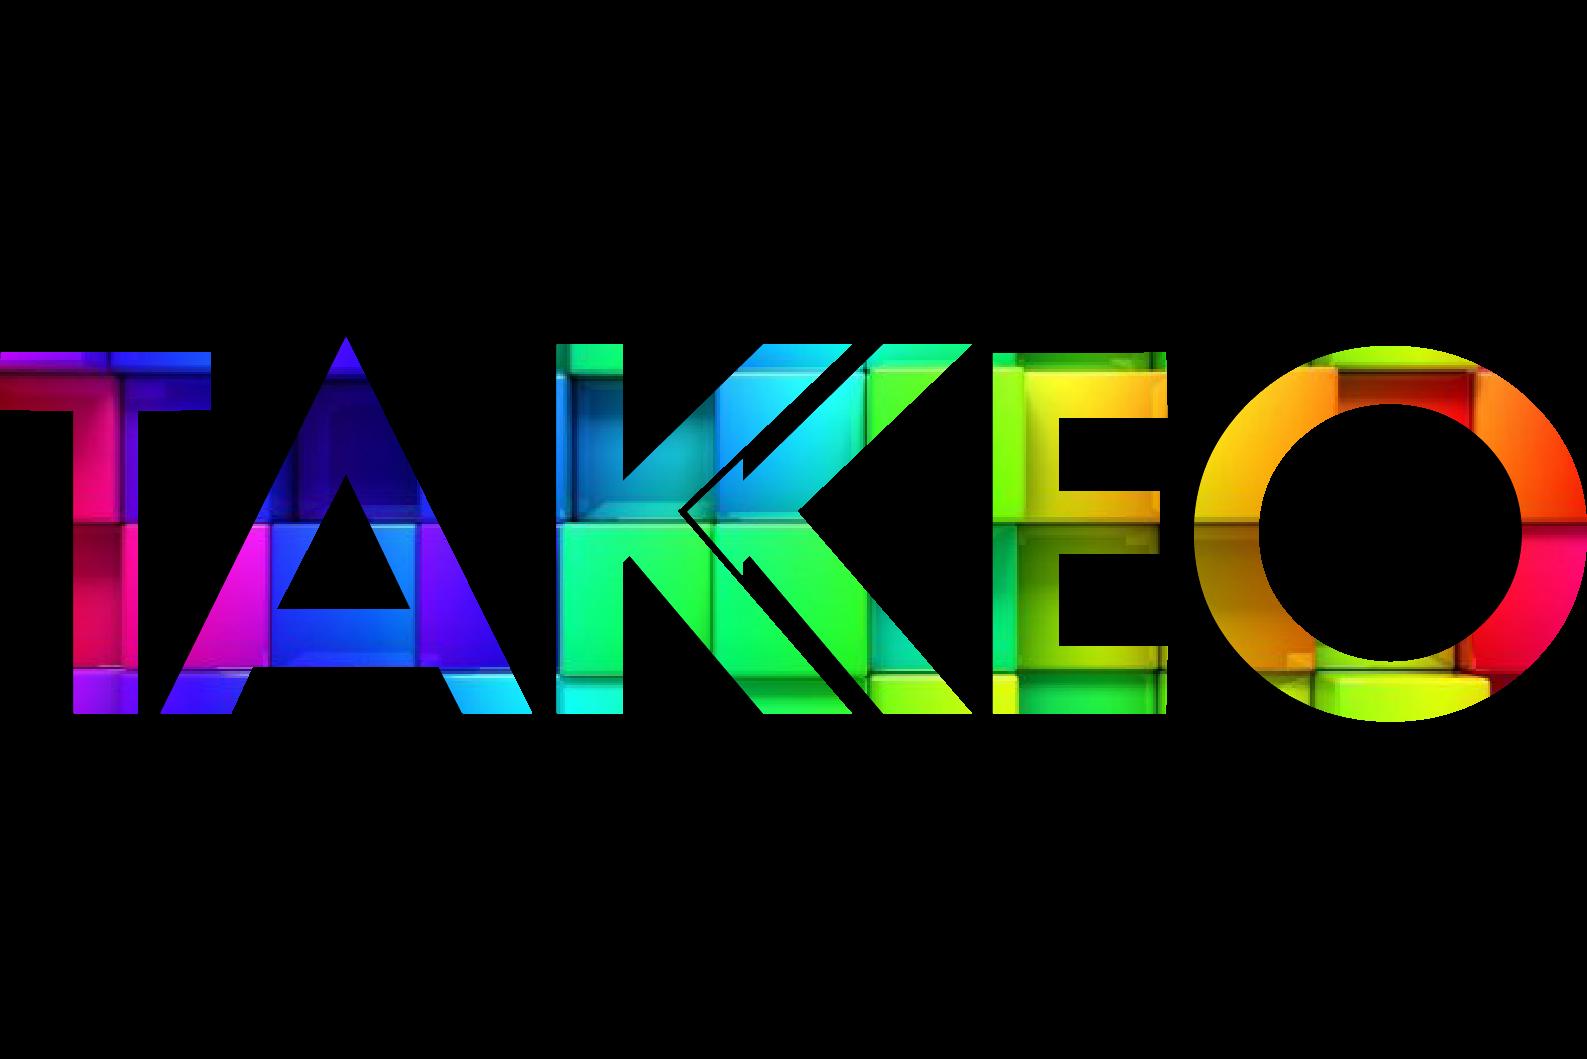 Takkeo